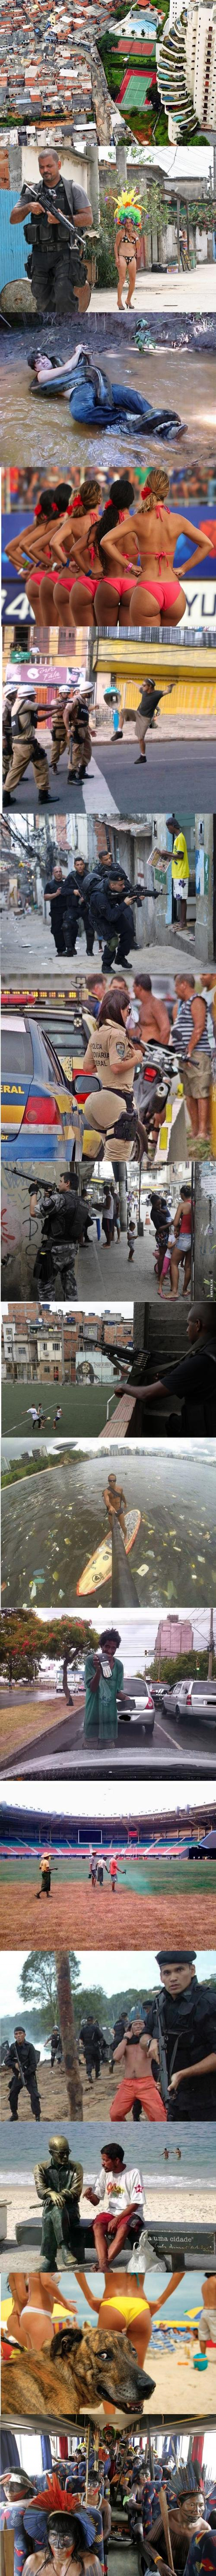 Fotografie z Brazílie